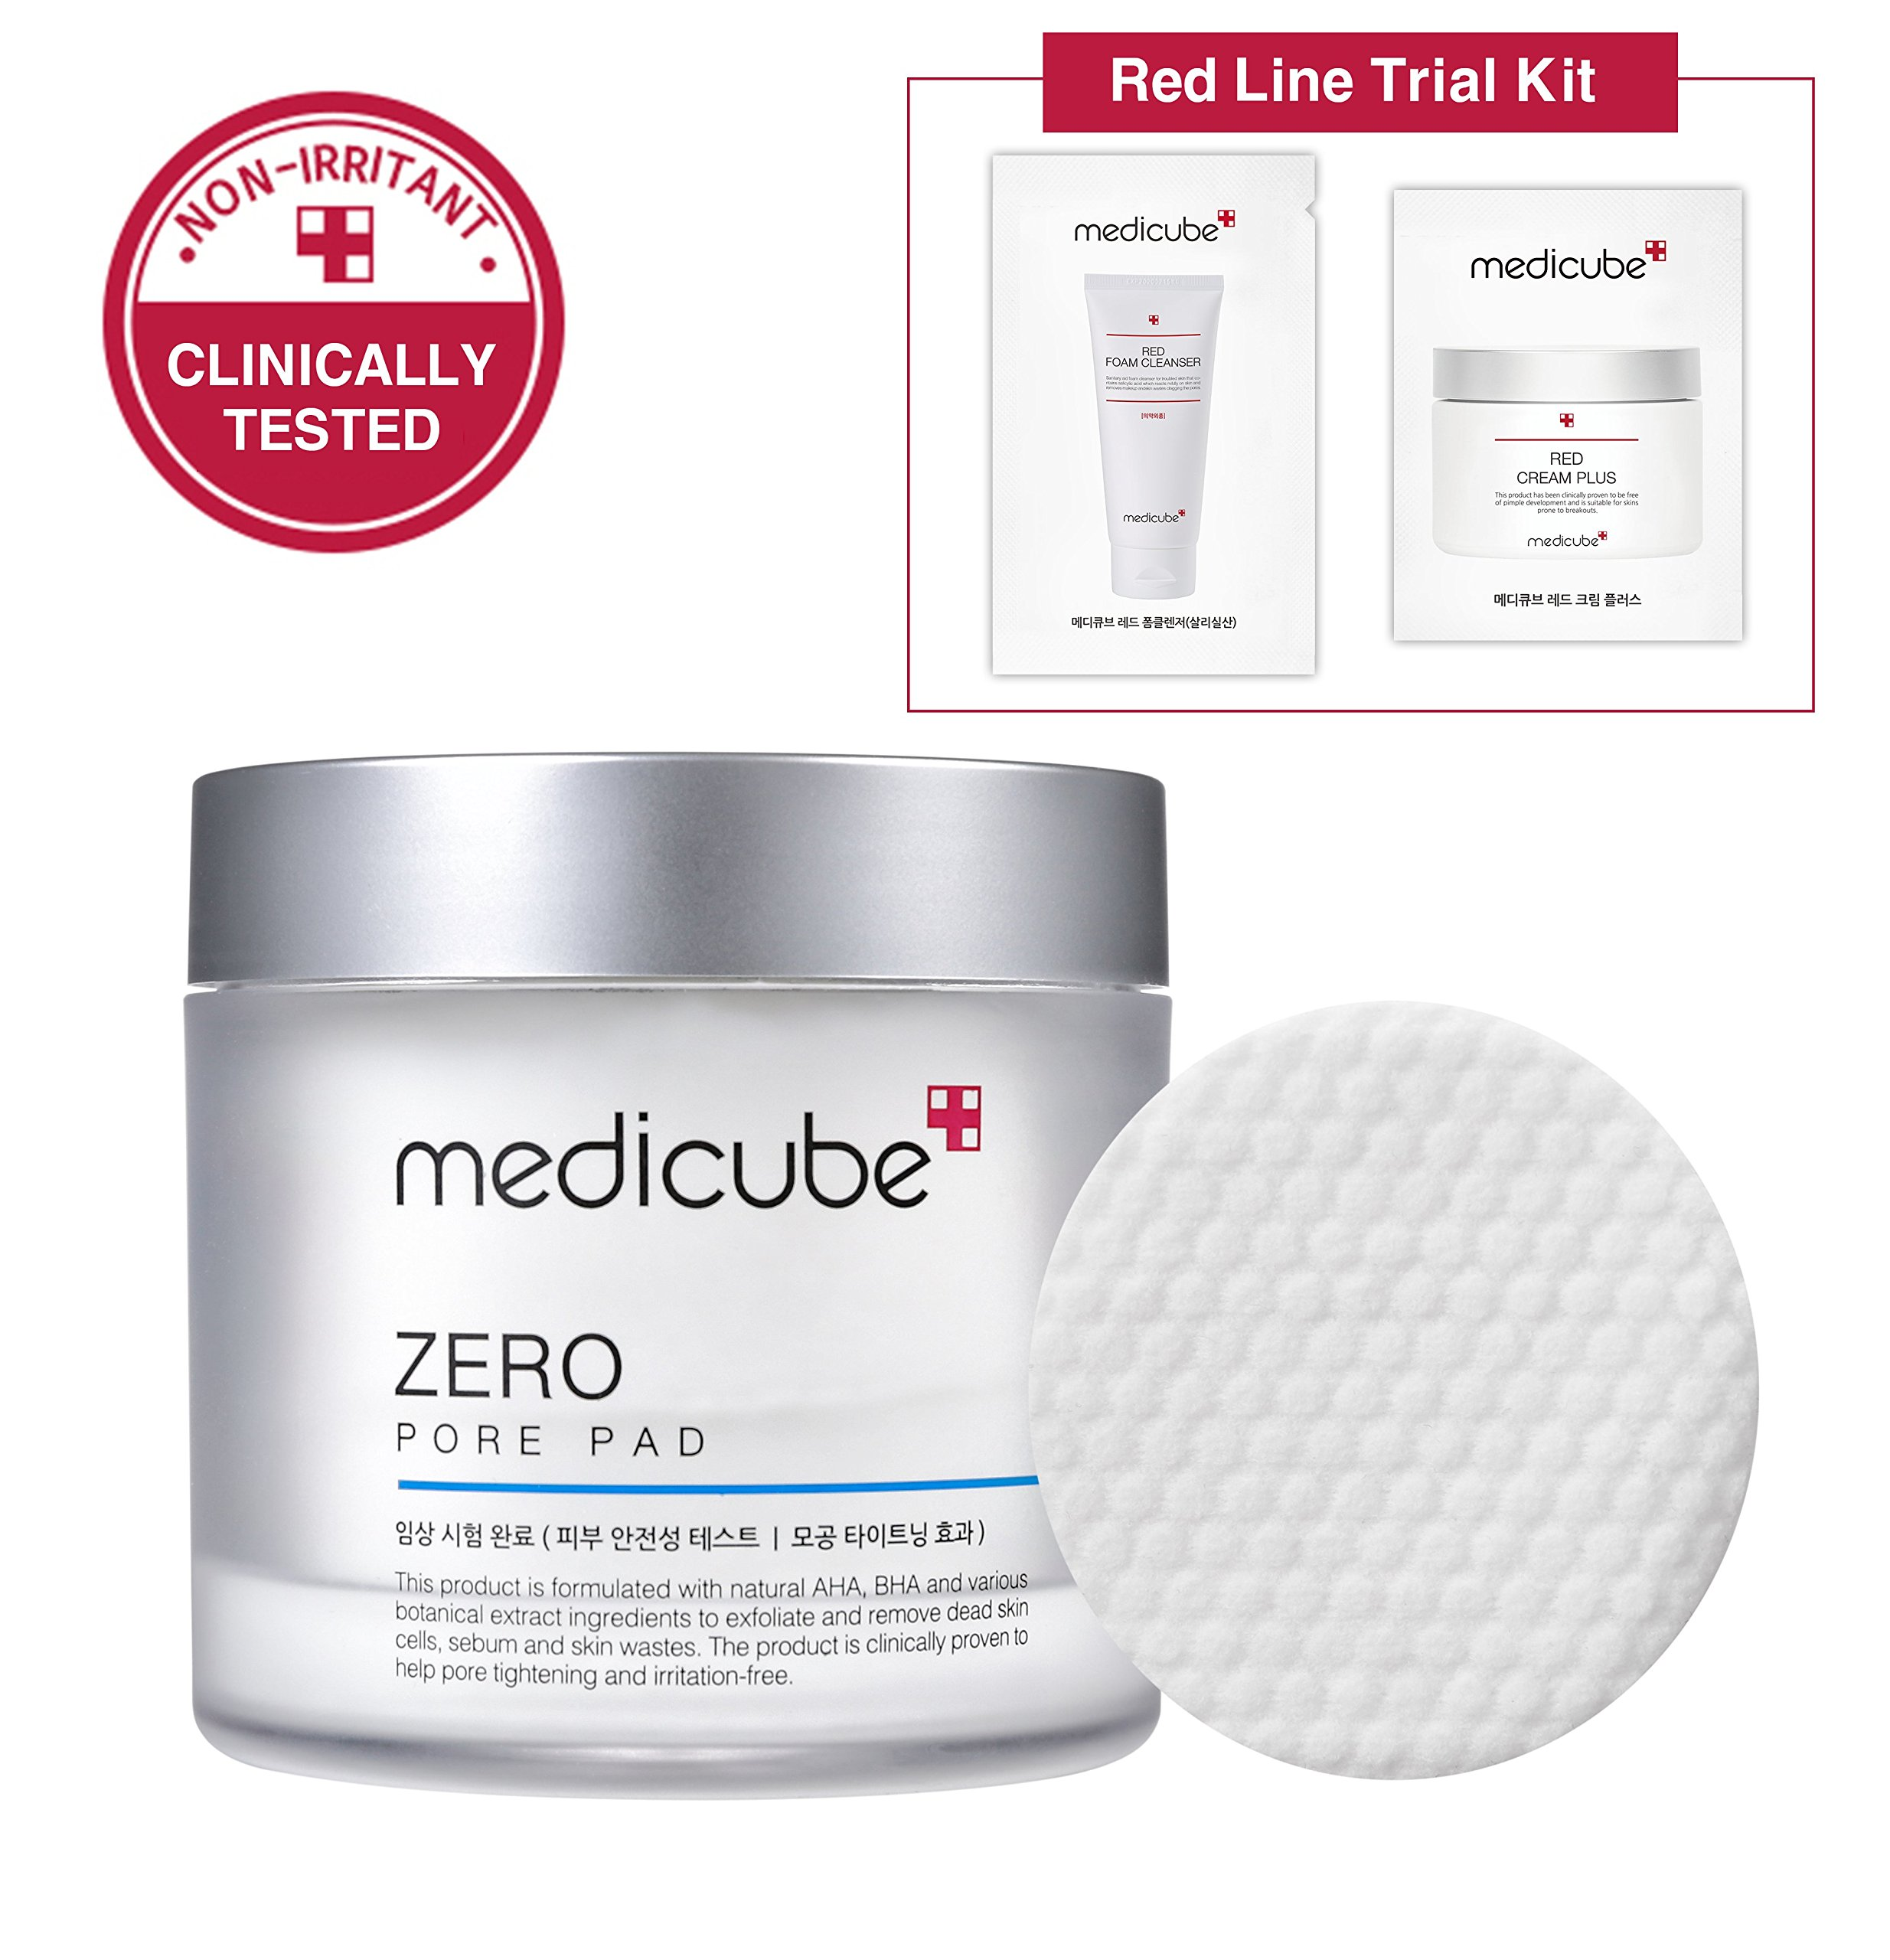 Medicube Zero Pore Pad and Red Line Trial Kit SET, 155 gle 5.47 oz.